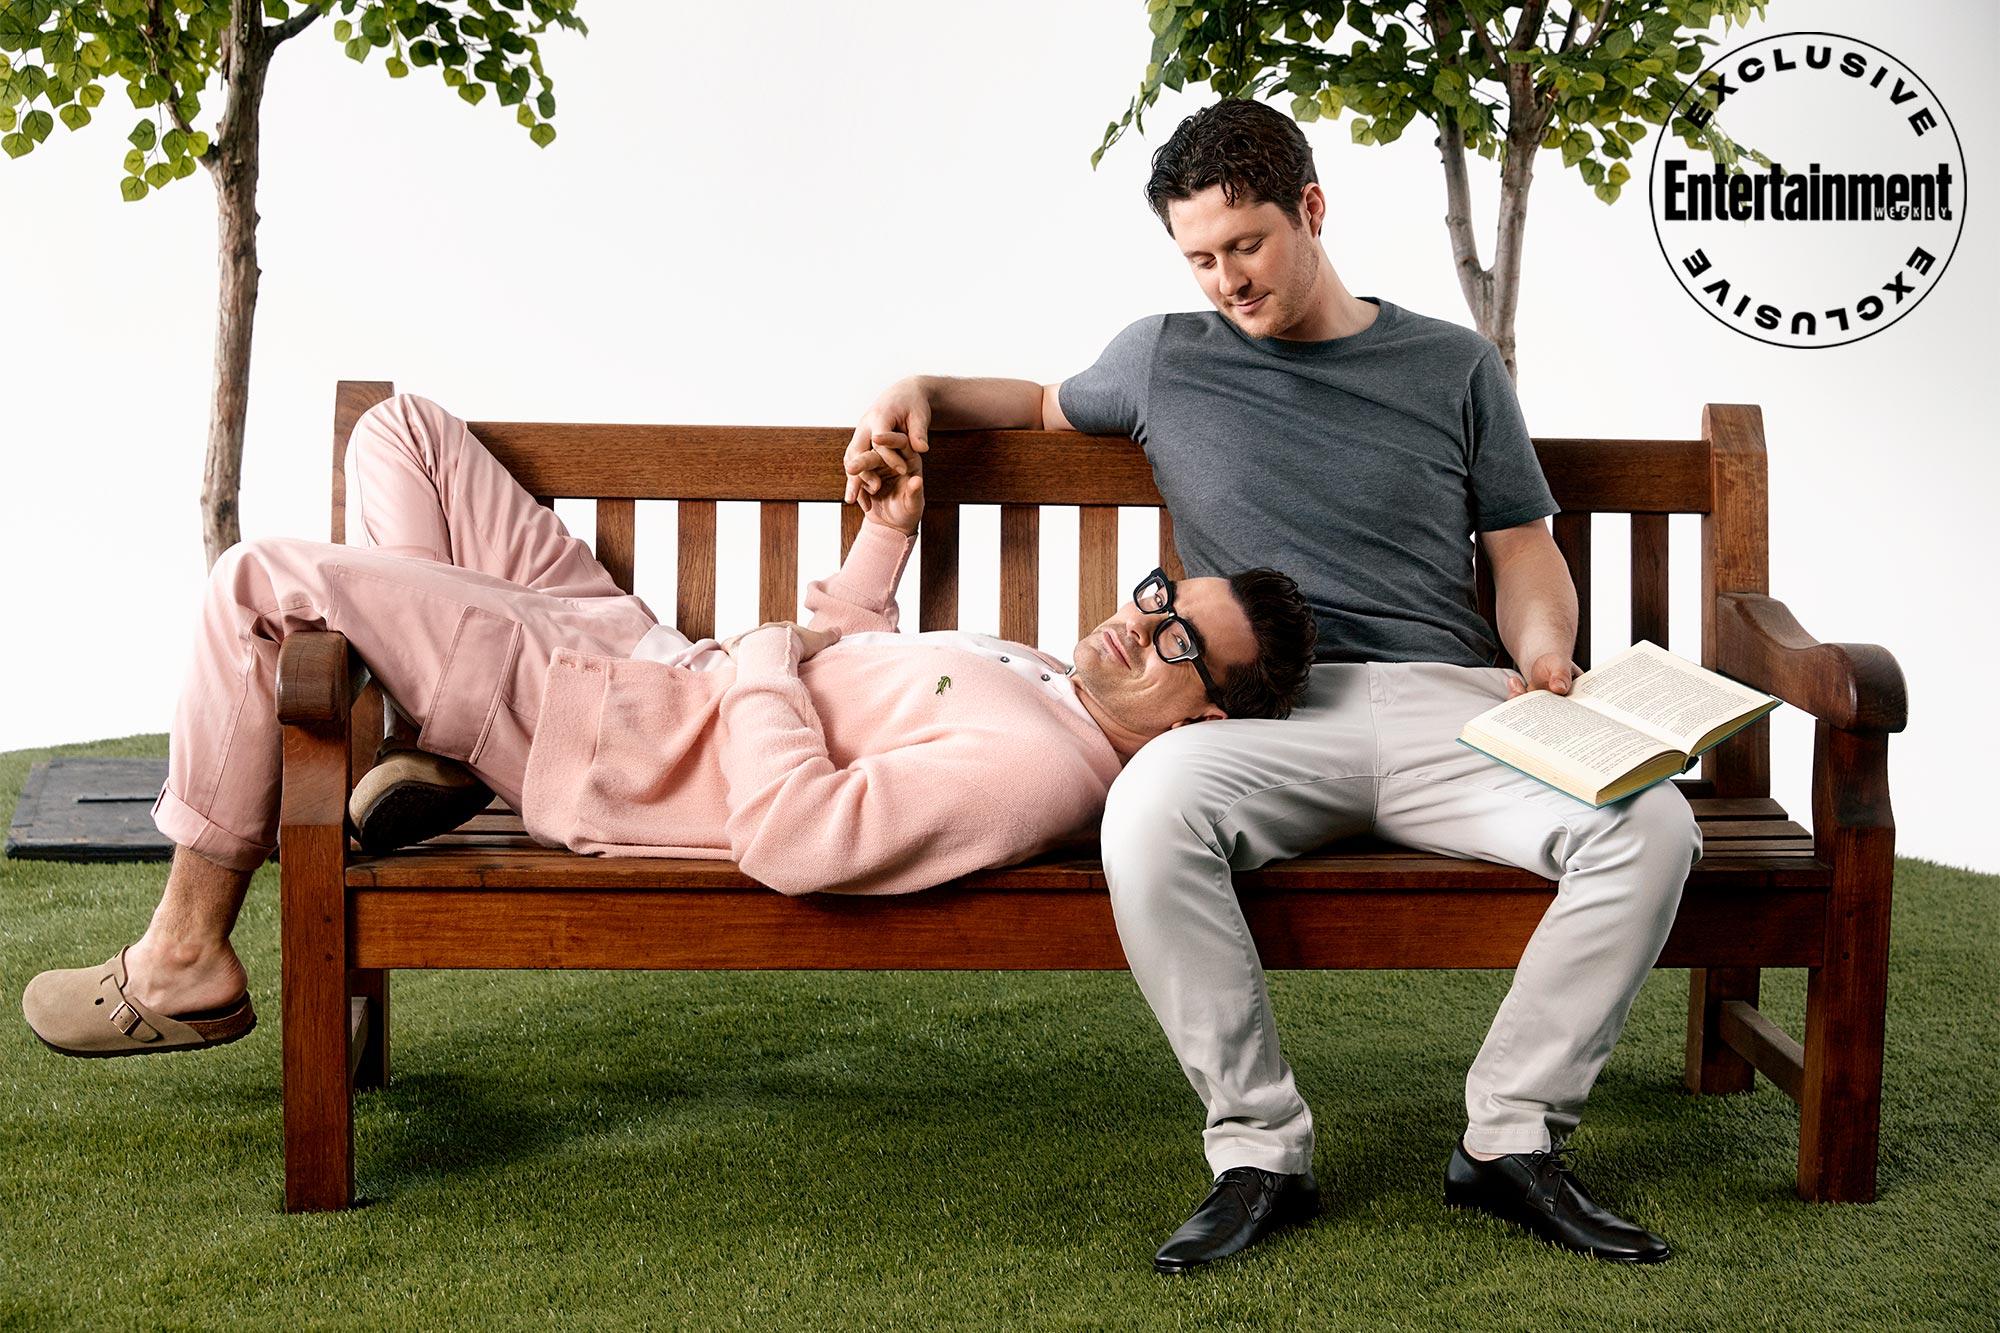 Schitt's Creek stars Dan Levy, Noah Reid recreate classic movie romance scenes